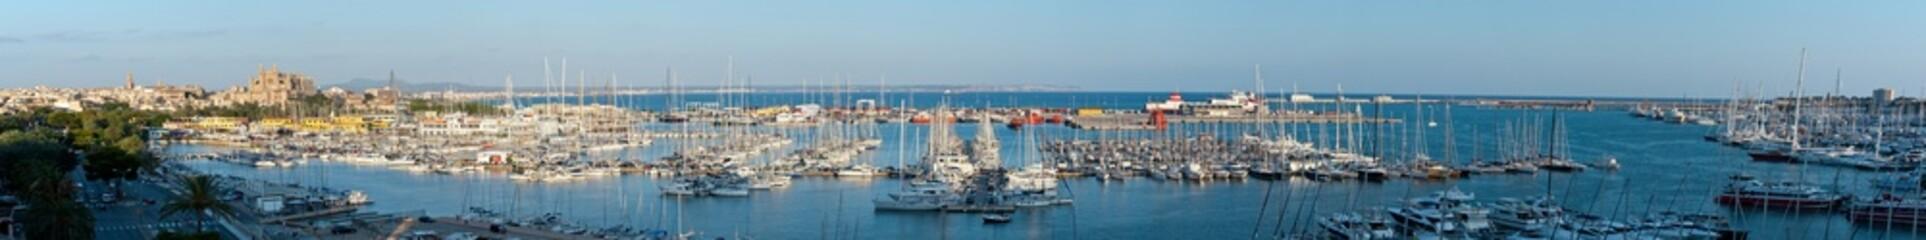 Panoramica di Palma De Mallorca